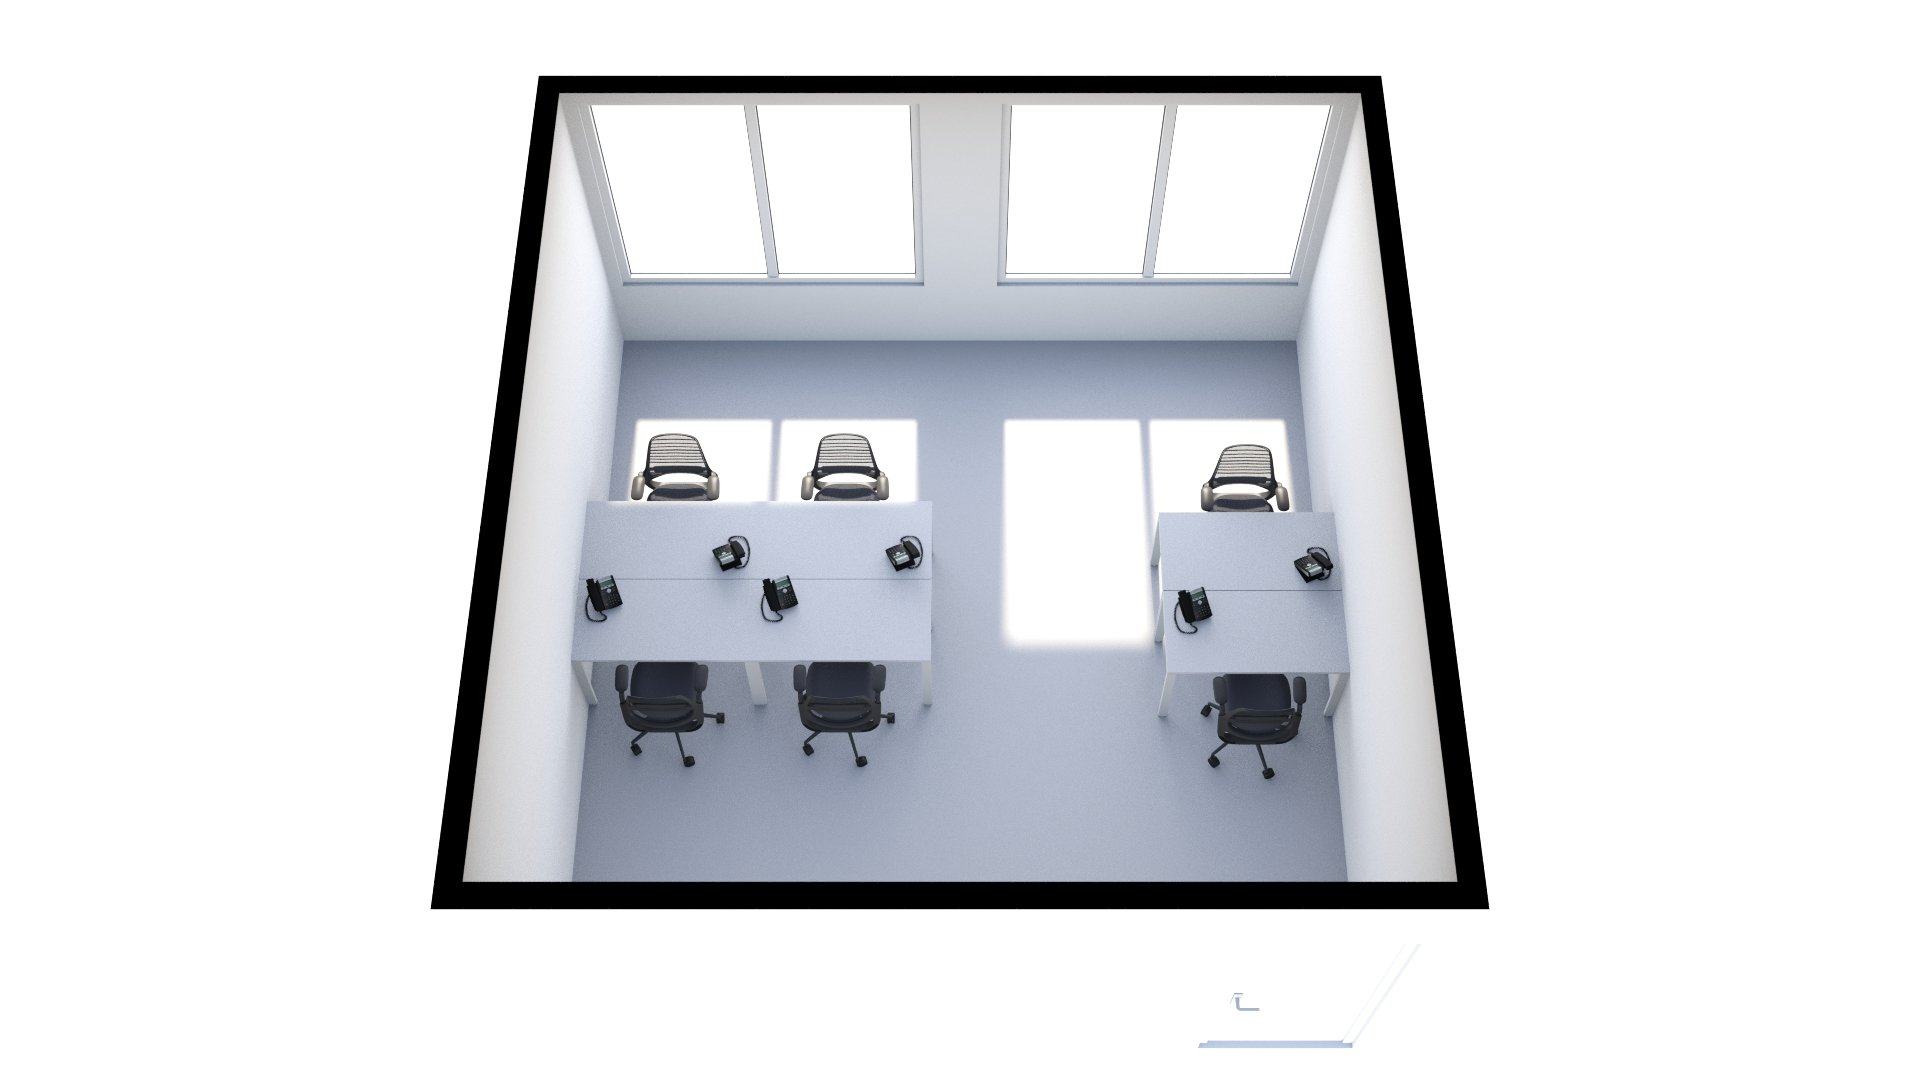 F3 Floorplan (3D View)